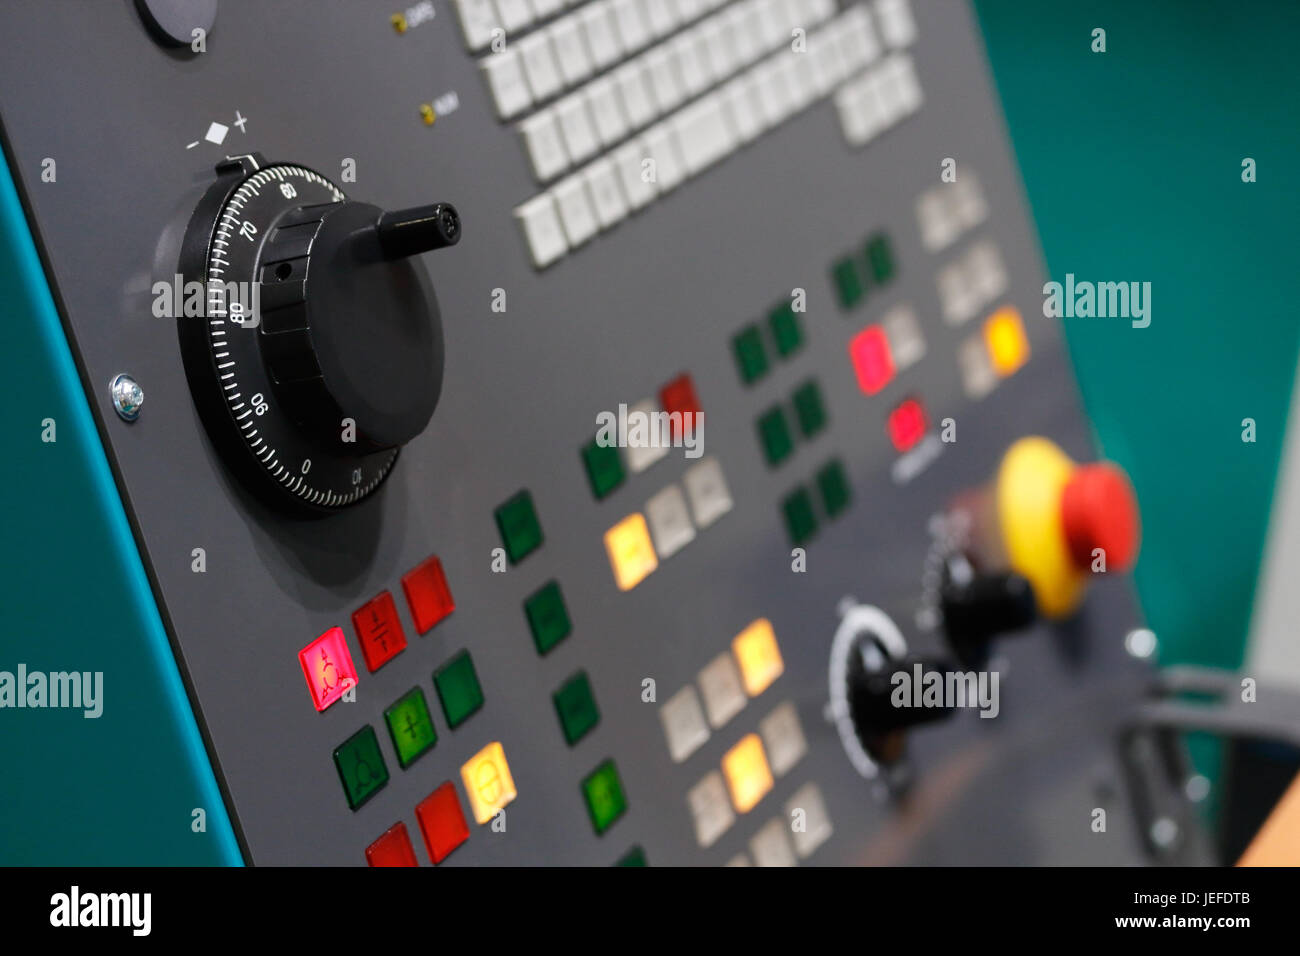 Control panel of cnc lathe machine. Selective focus. - Stock Image